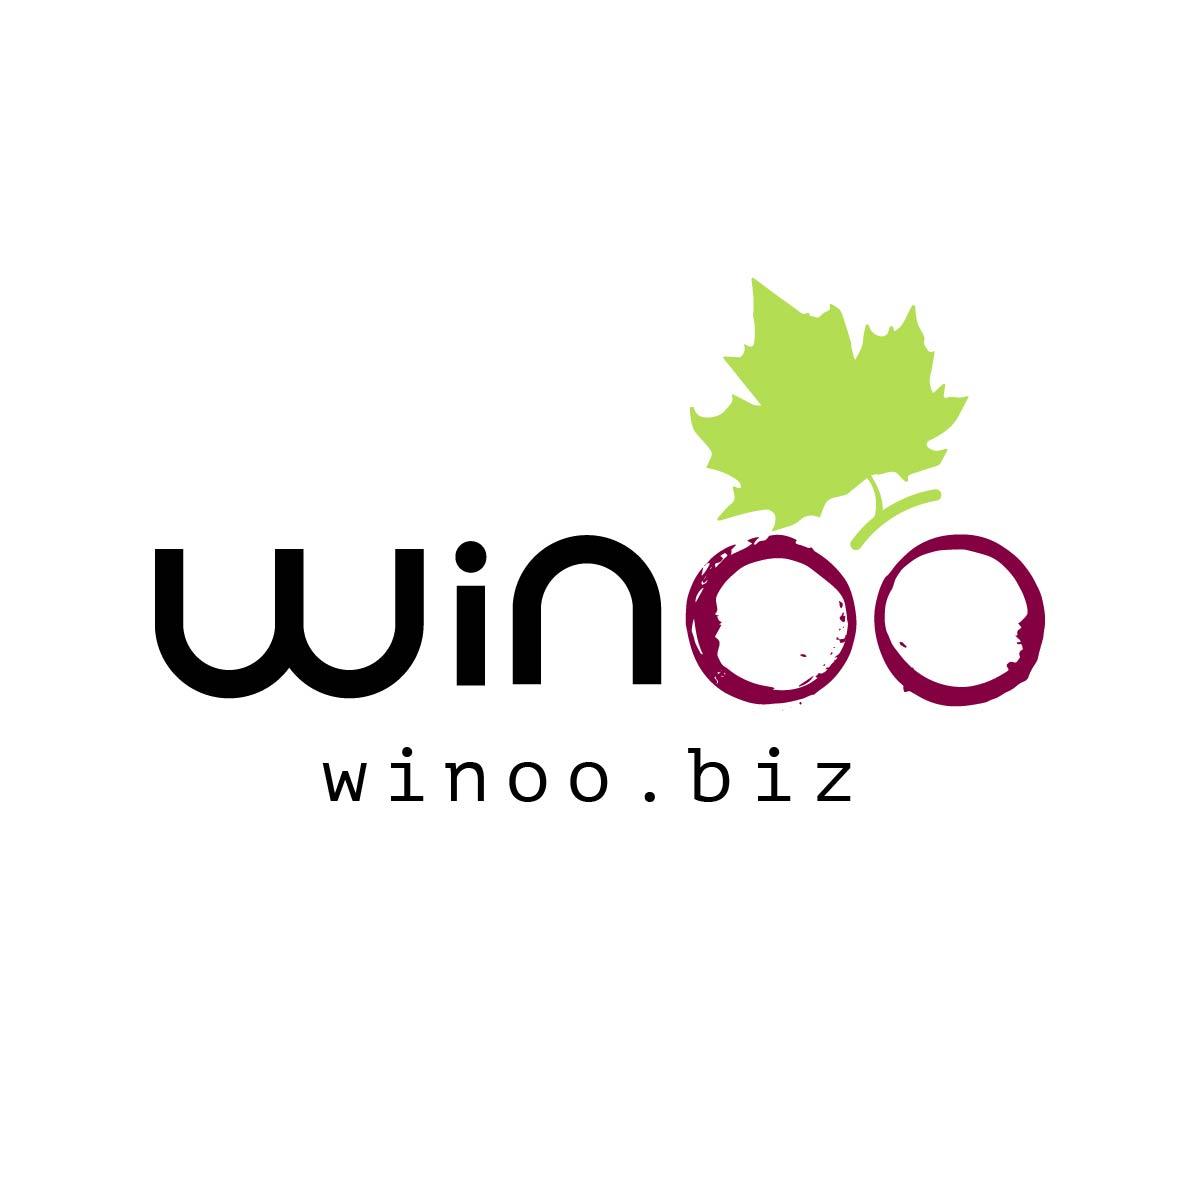 winoo logo - Brand design by Brandizle